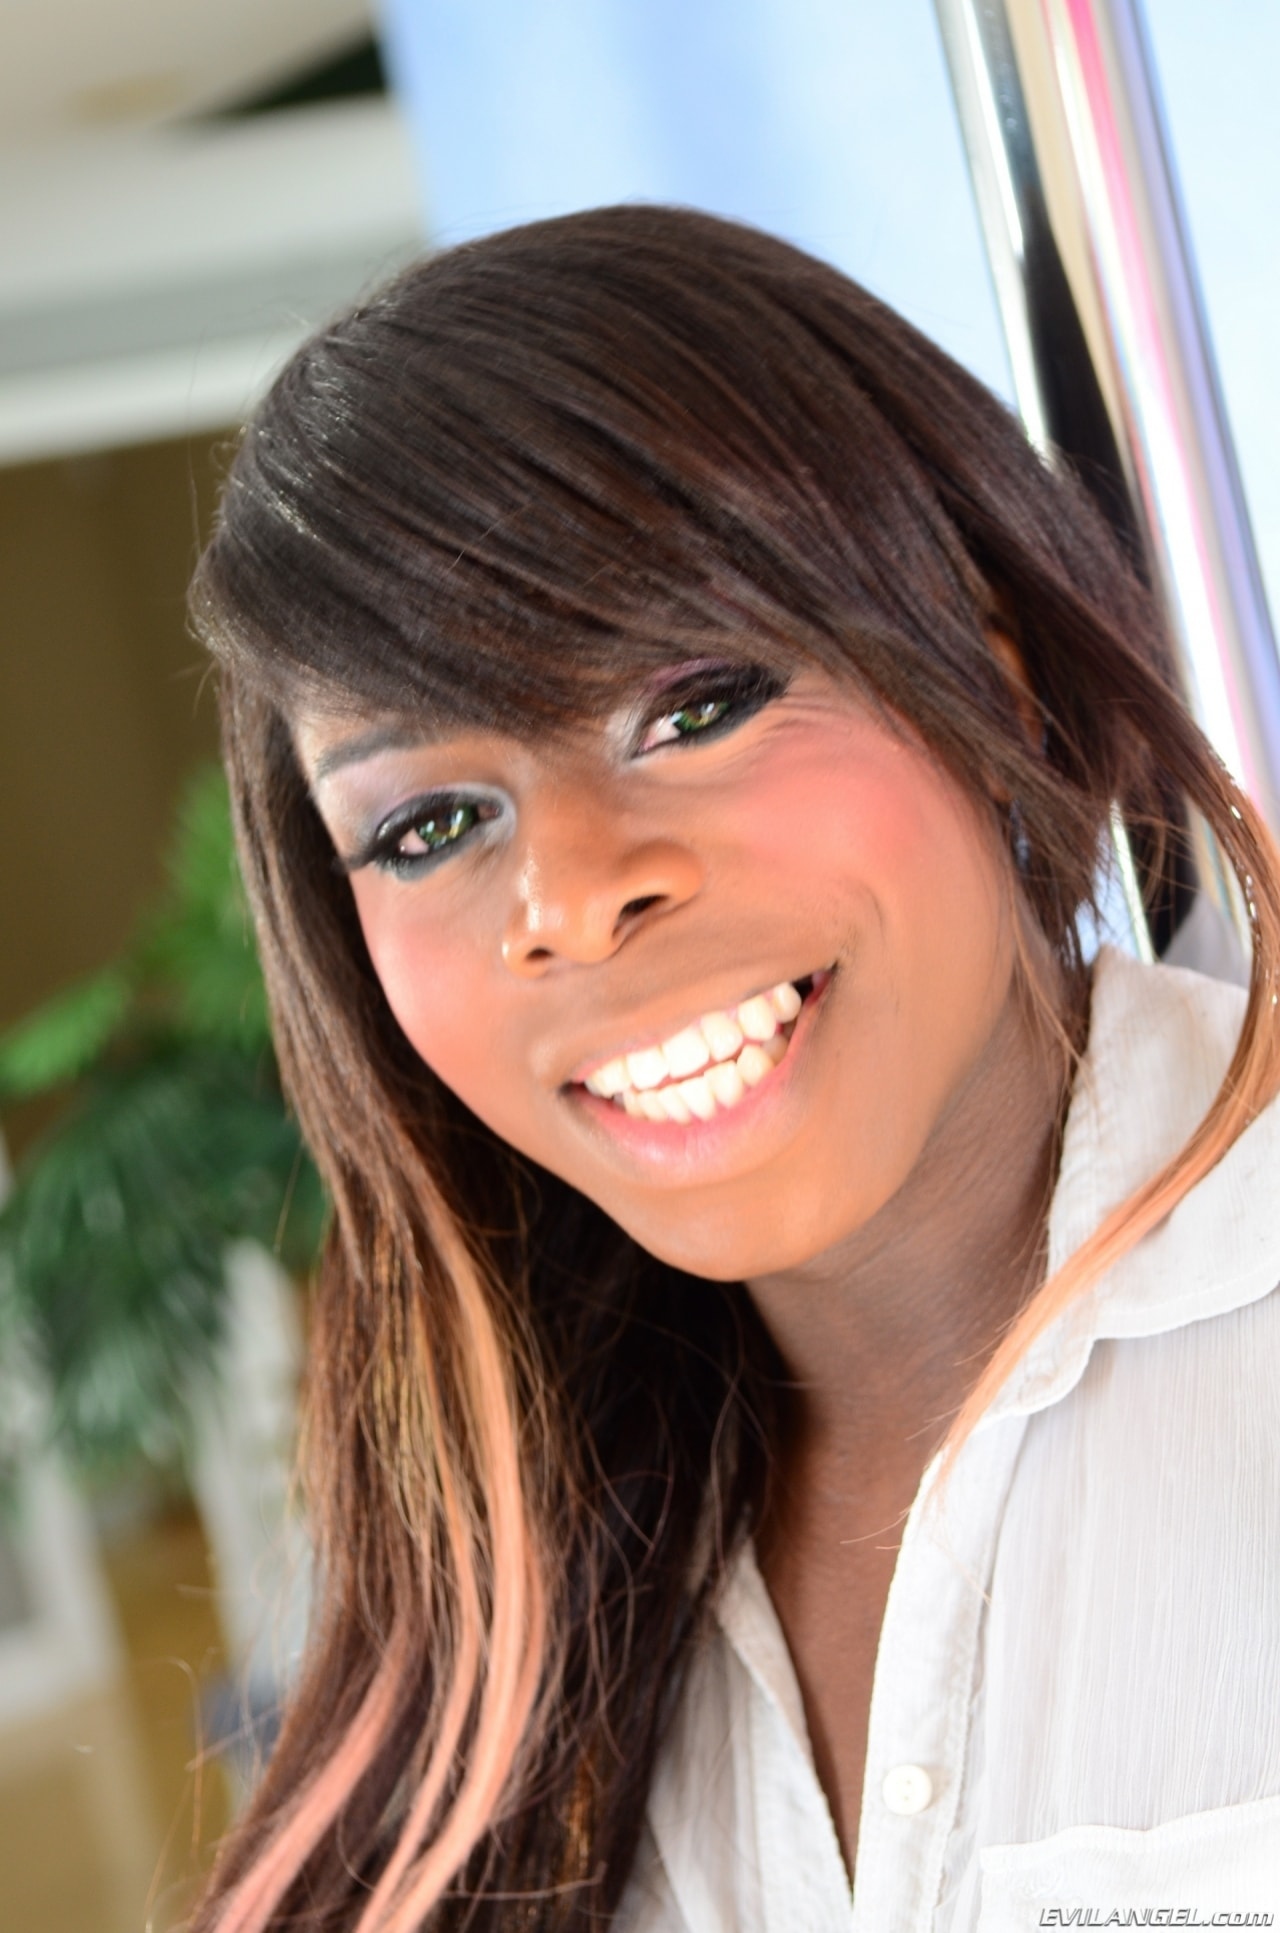 I Love Black Shemales 'Black Shemale Idol - The Auditions 04' starring Bambi Prescott (Photo 7)